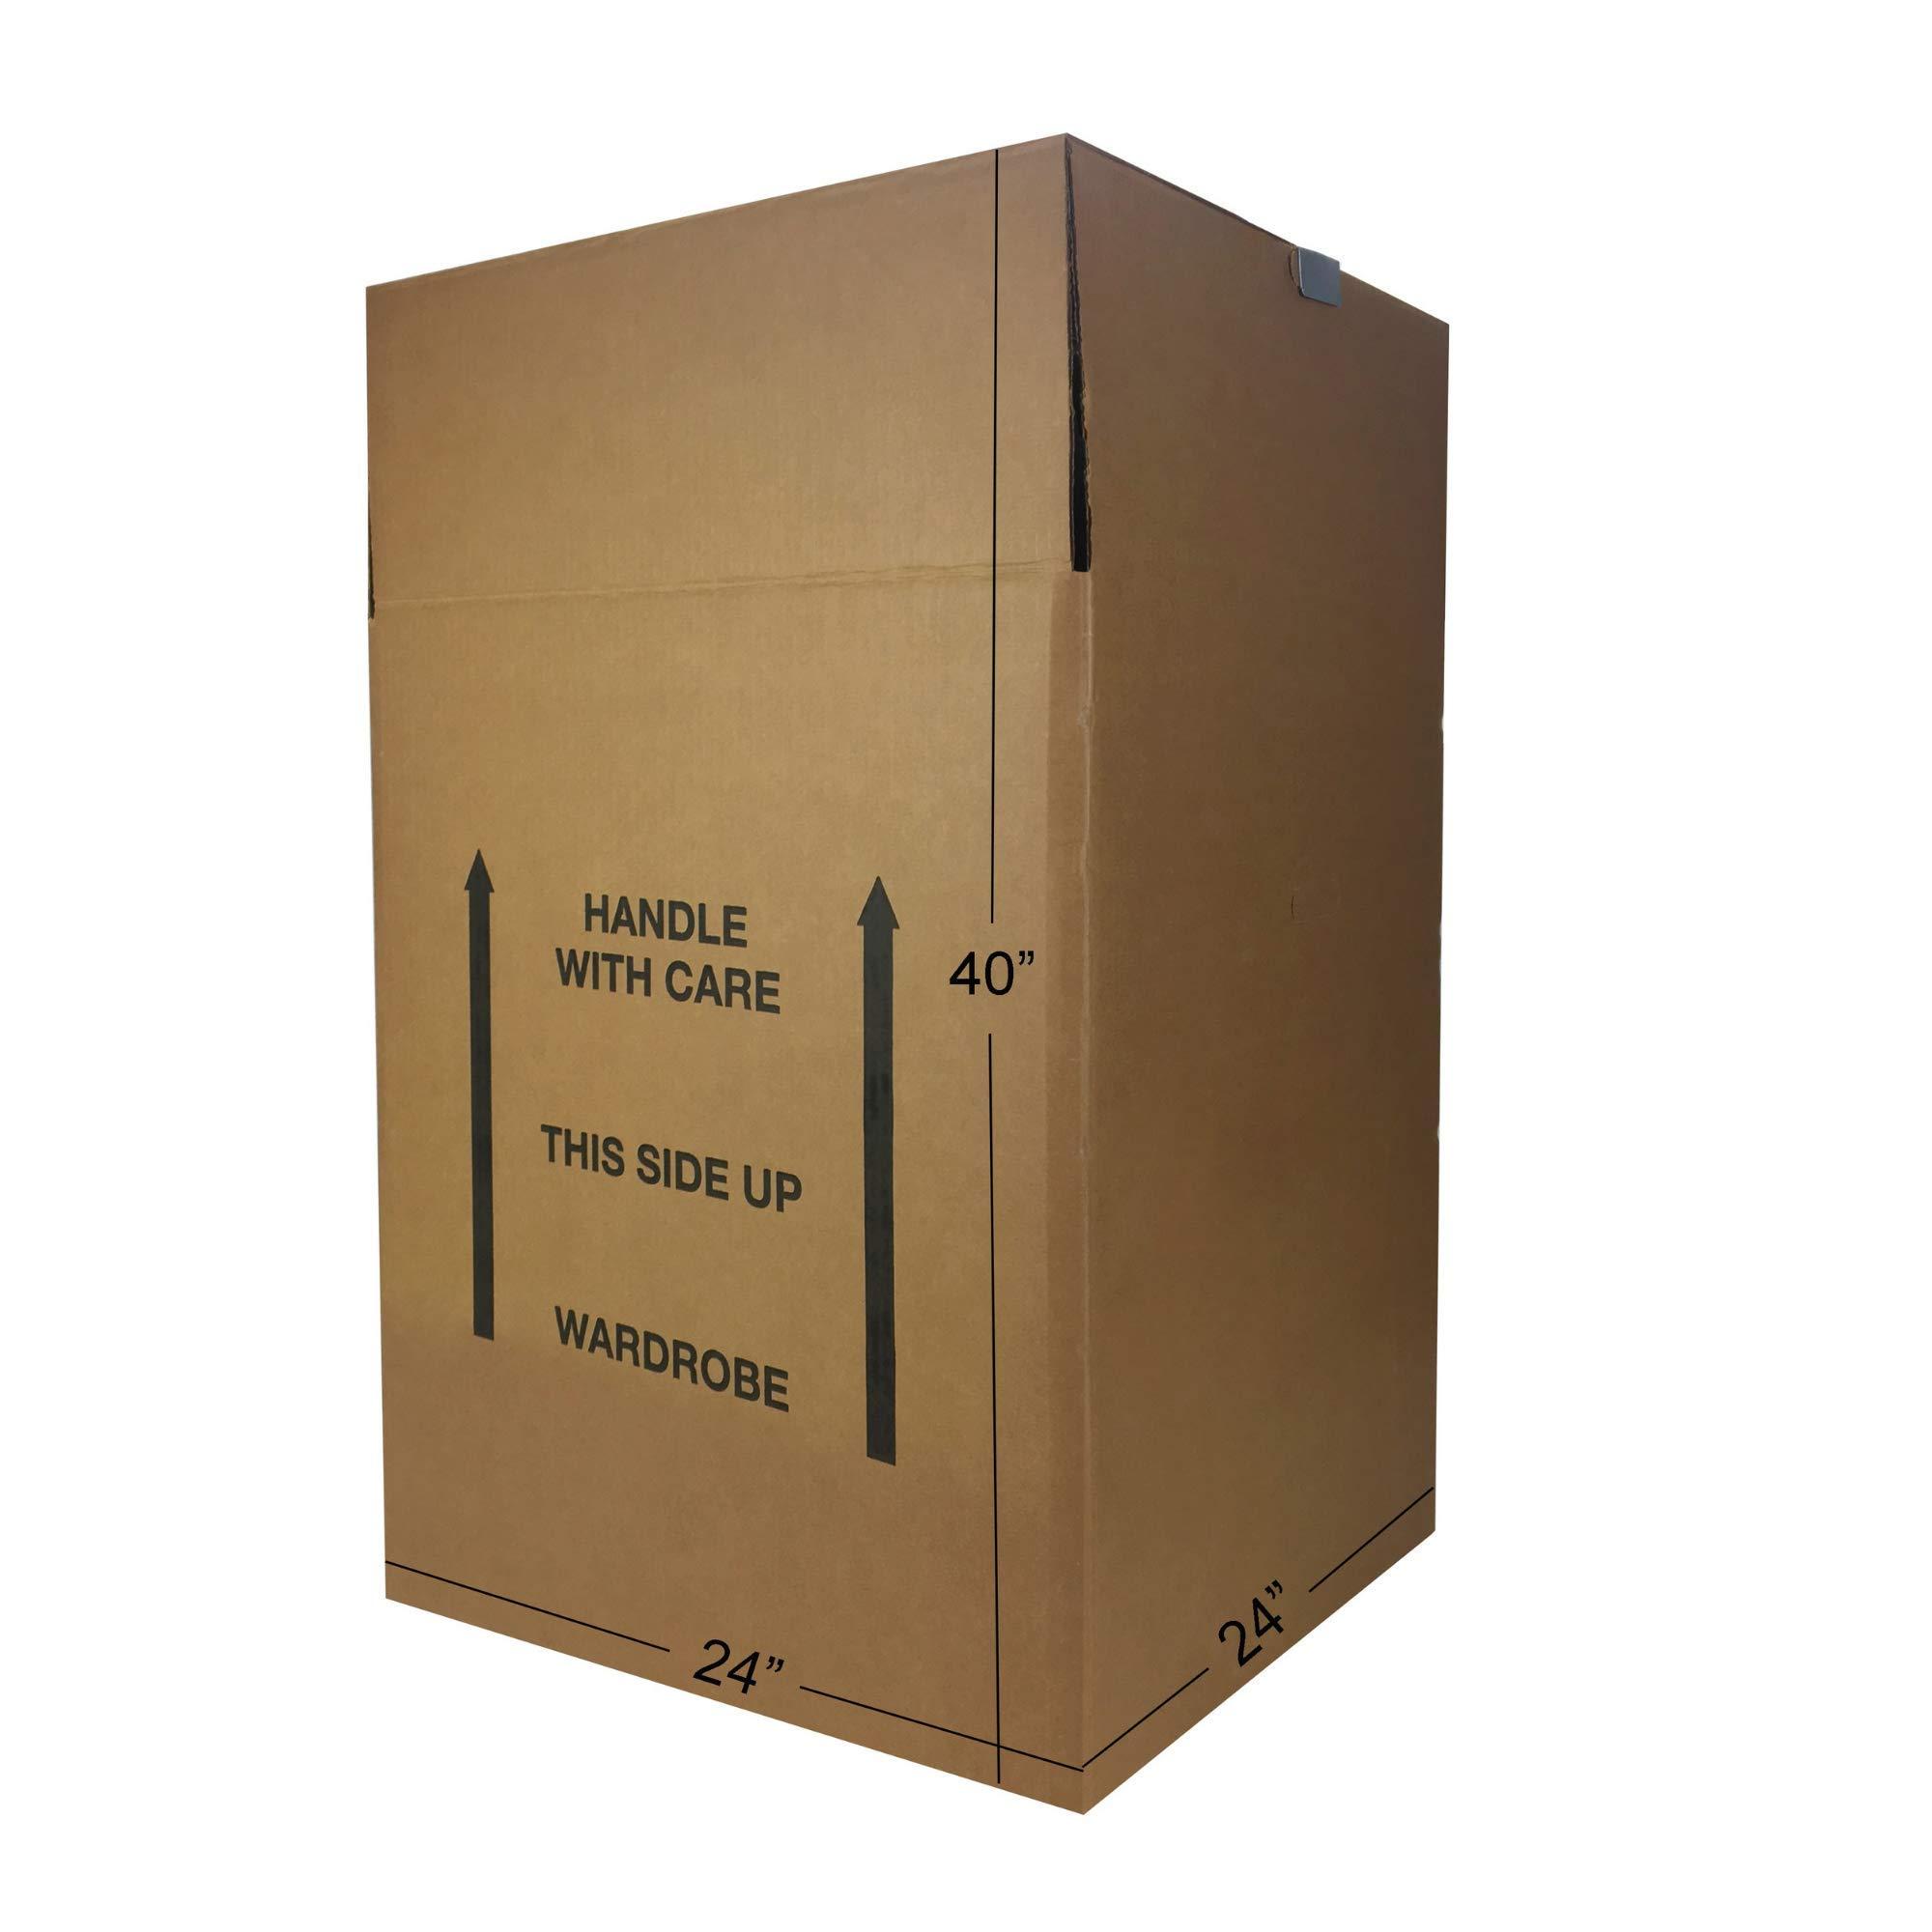 Uboxes BOXMINIWAR06 Shorty Space Saving Wardrobe Moving Boxes (Bundle of 6) 20'' x 20'' x 34'' Moving Boxes